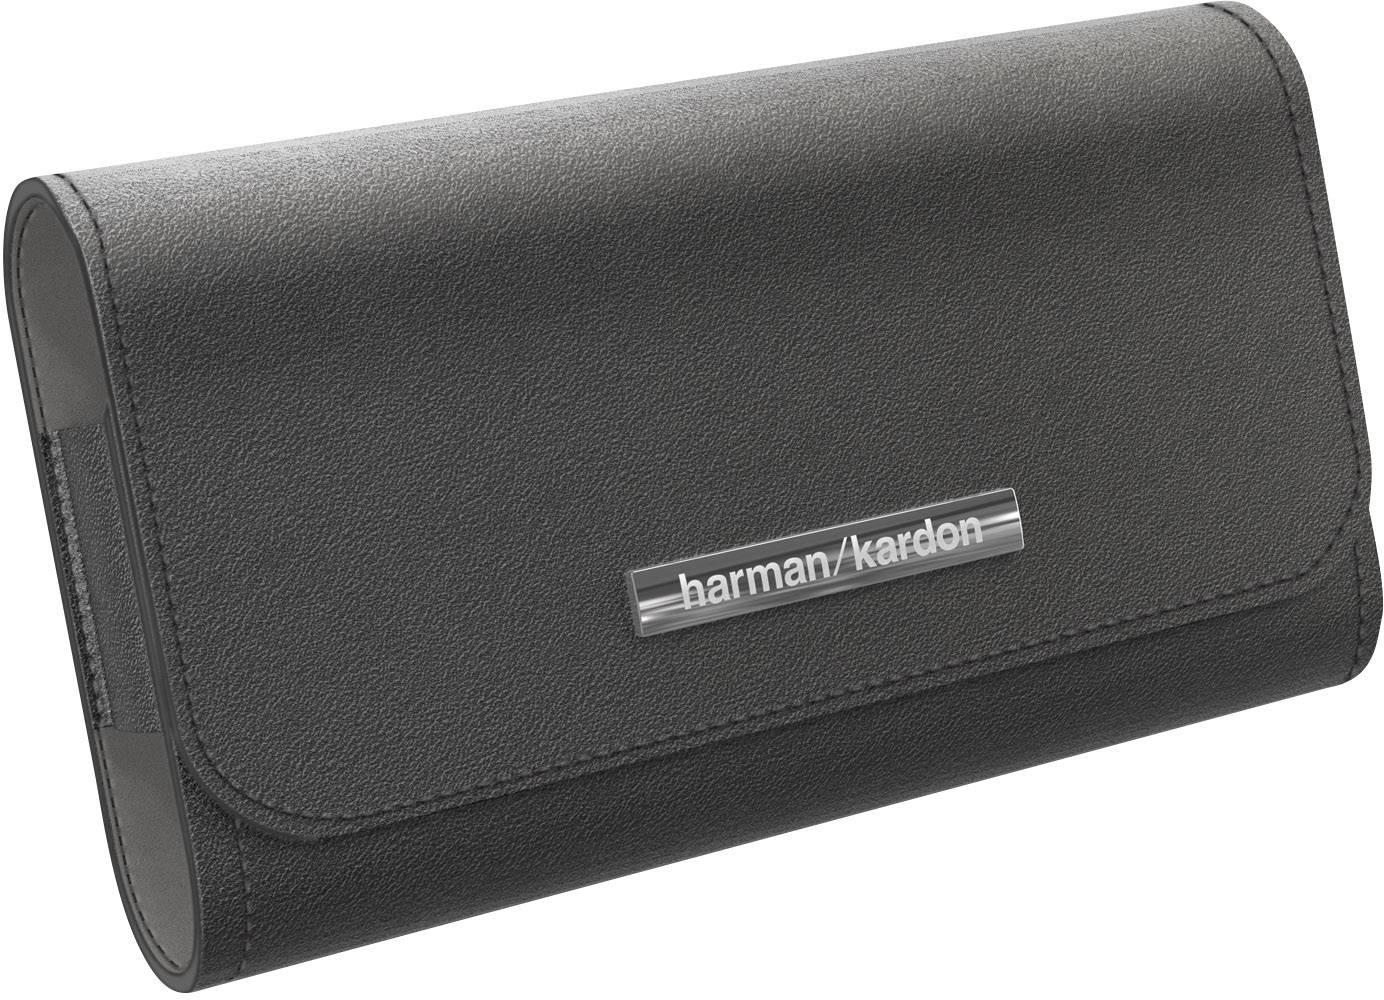 41acc0abd52 Harman Kardon Esquire Mini Case draagtasje, Zwart | Conrad.nl